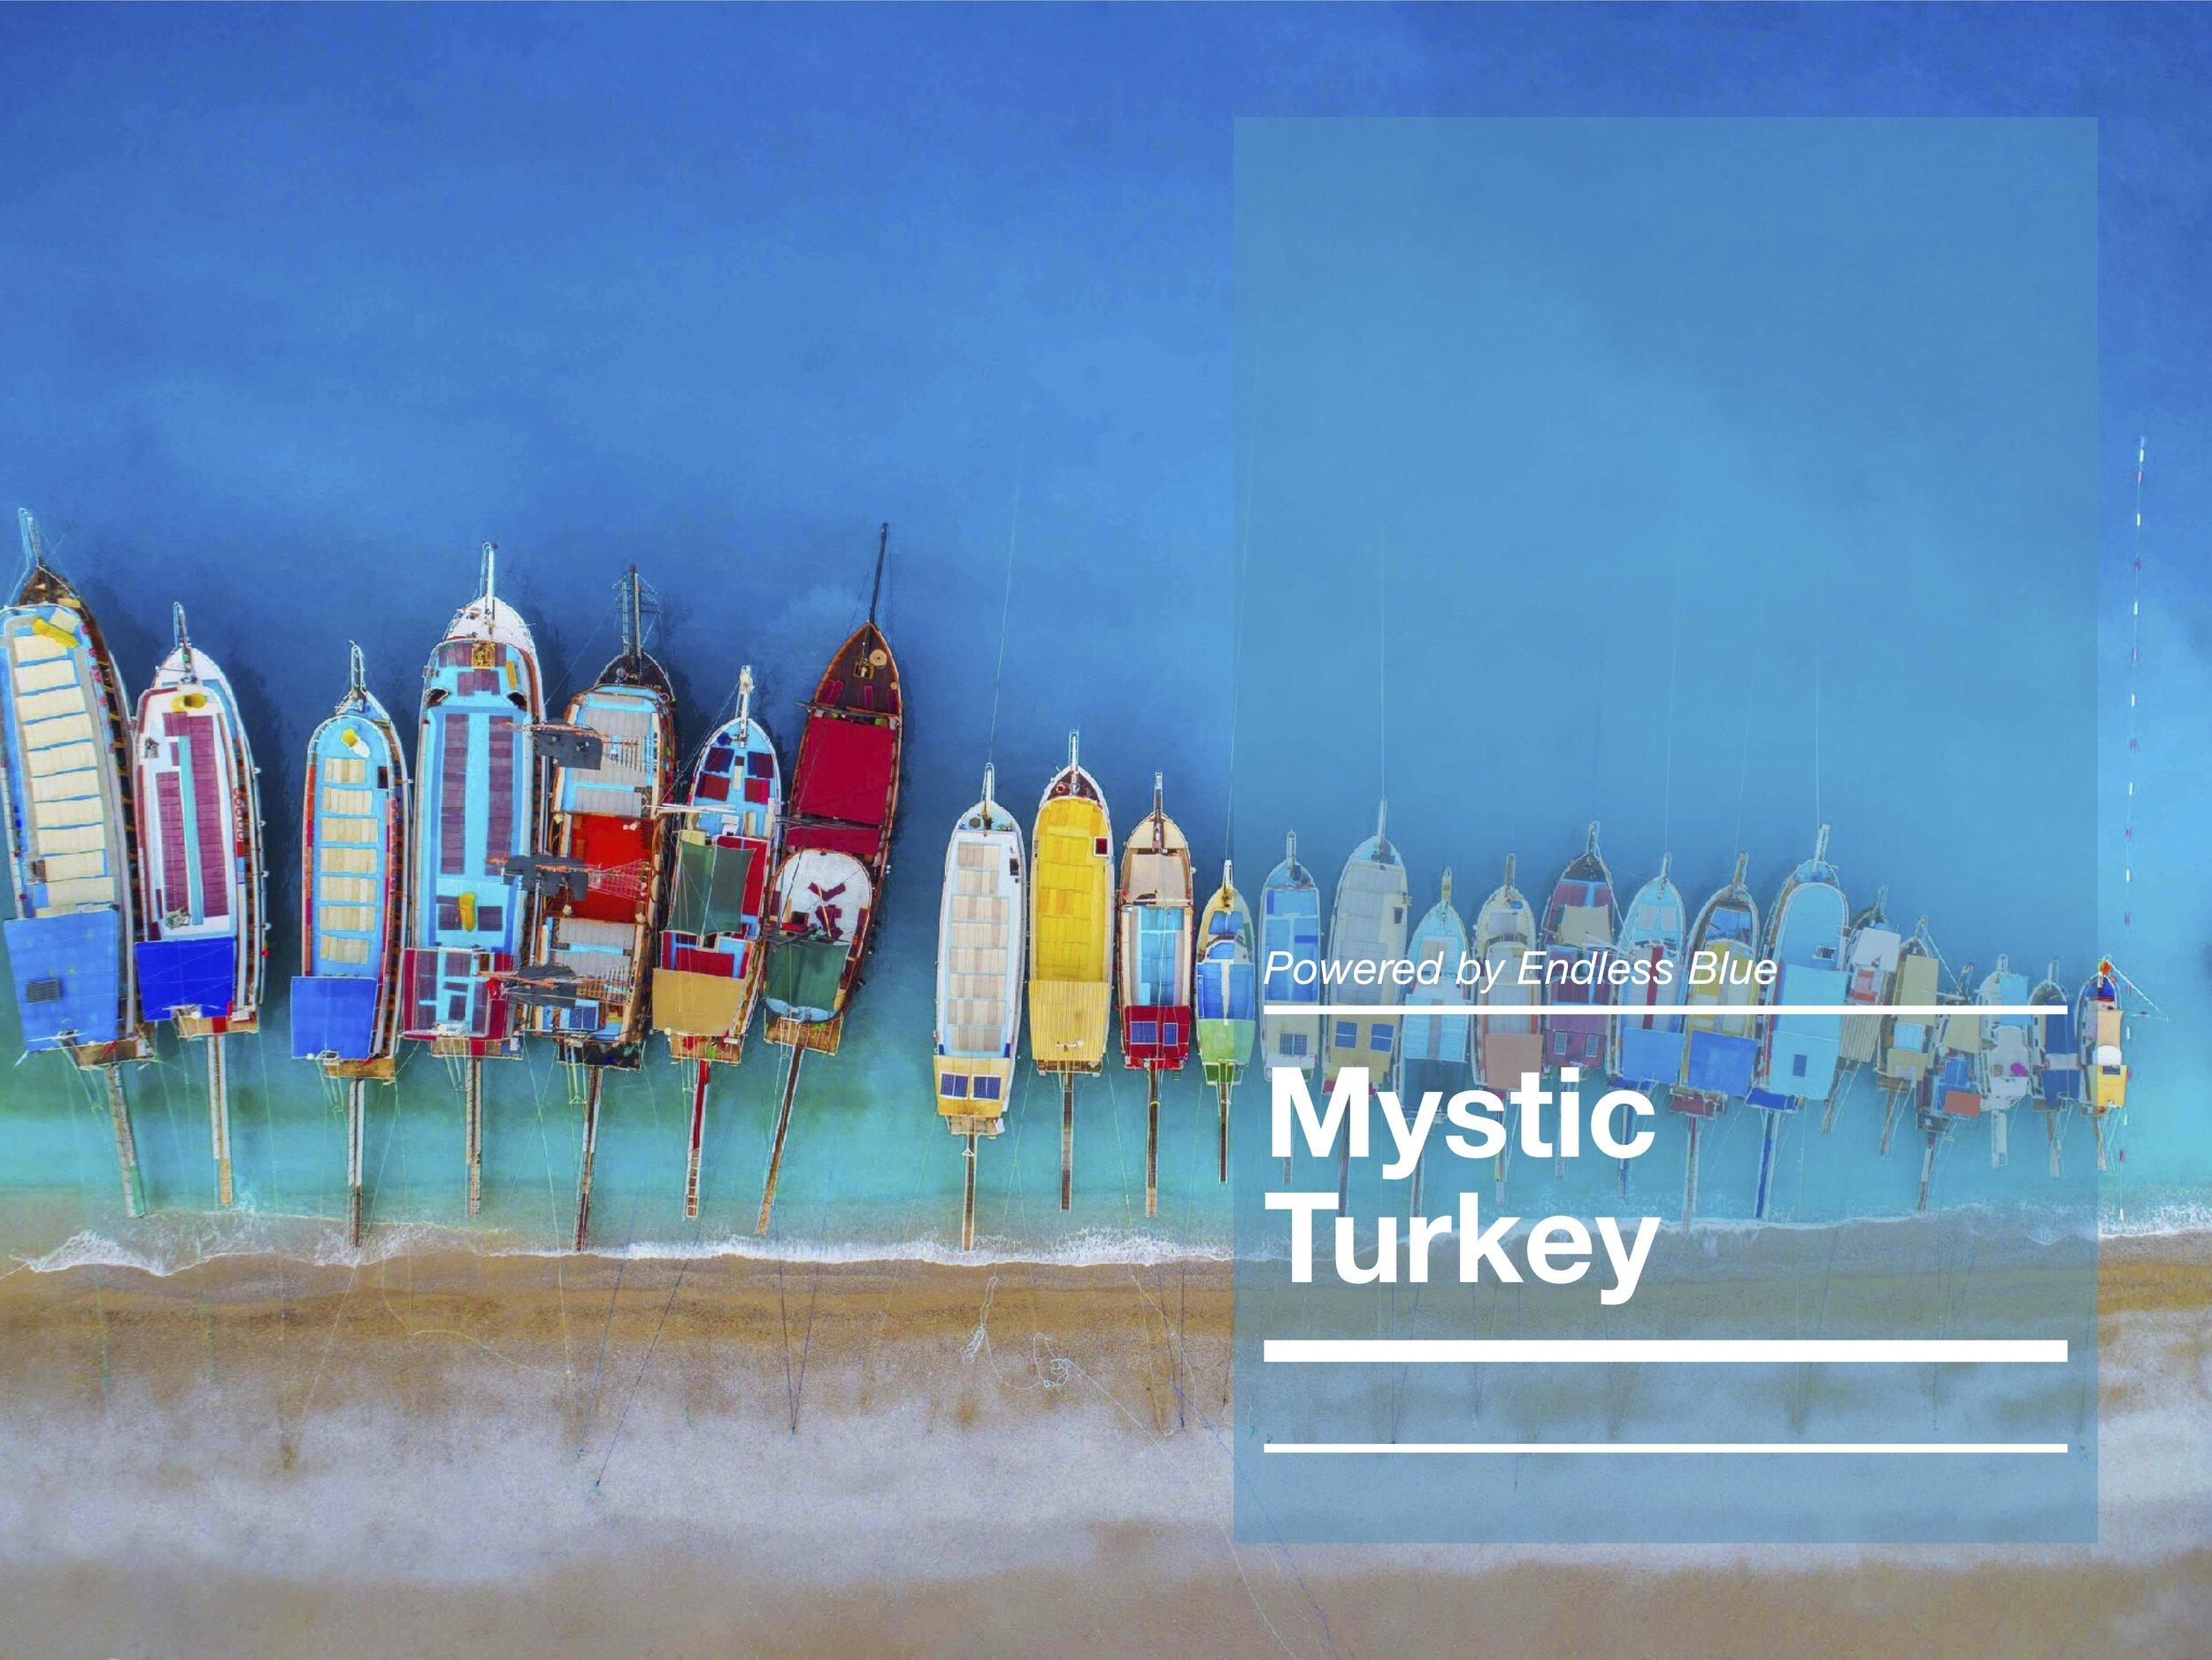 MYSTIC TURKEY COVER SHOT.jpg